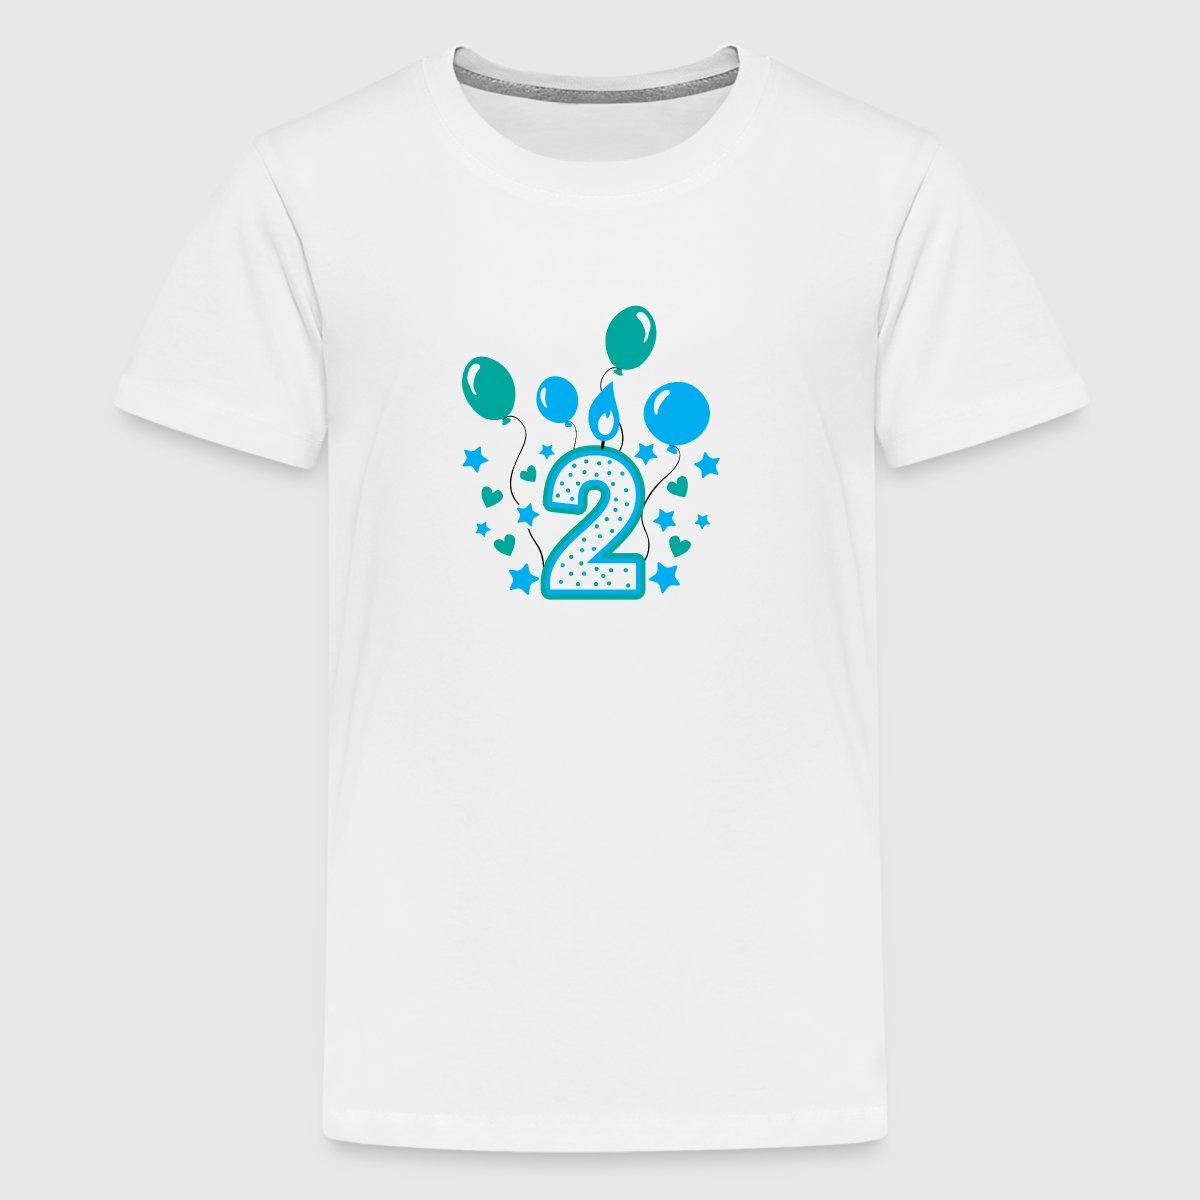 2nd Birthday Boy Shirts